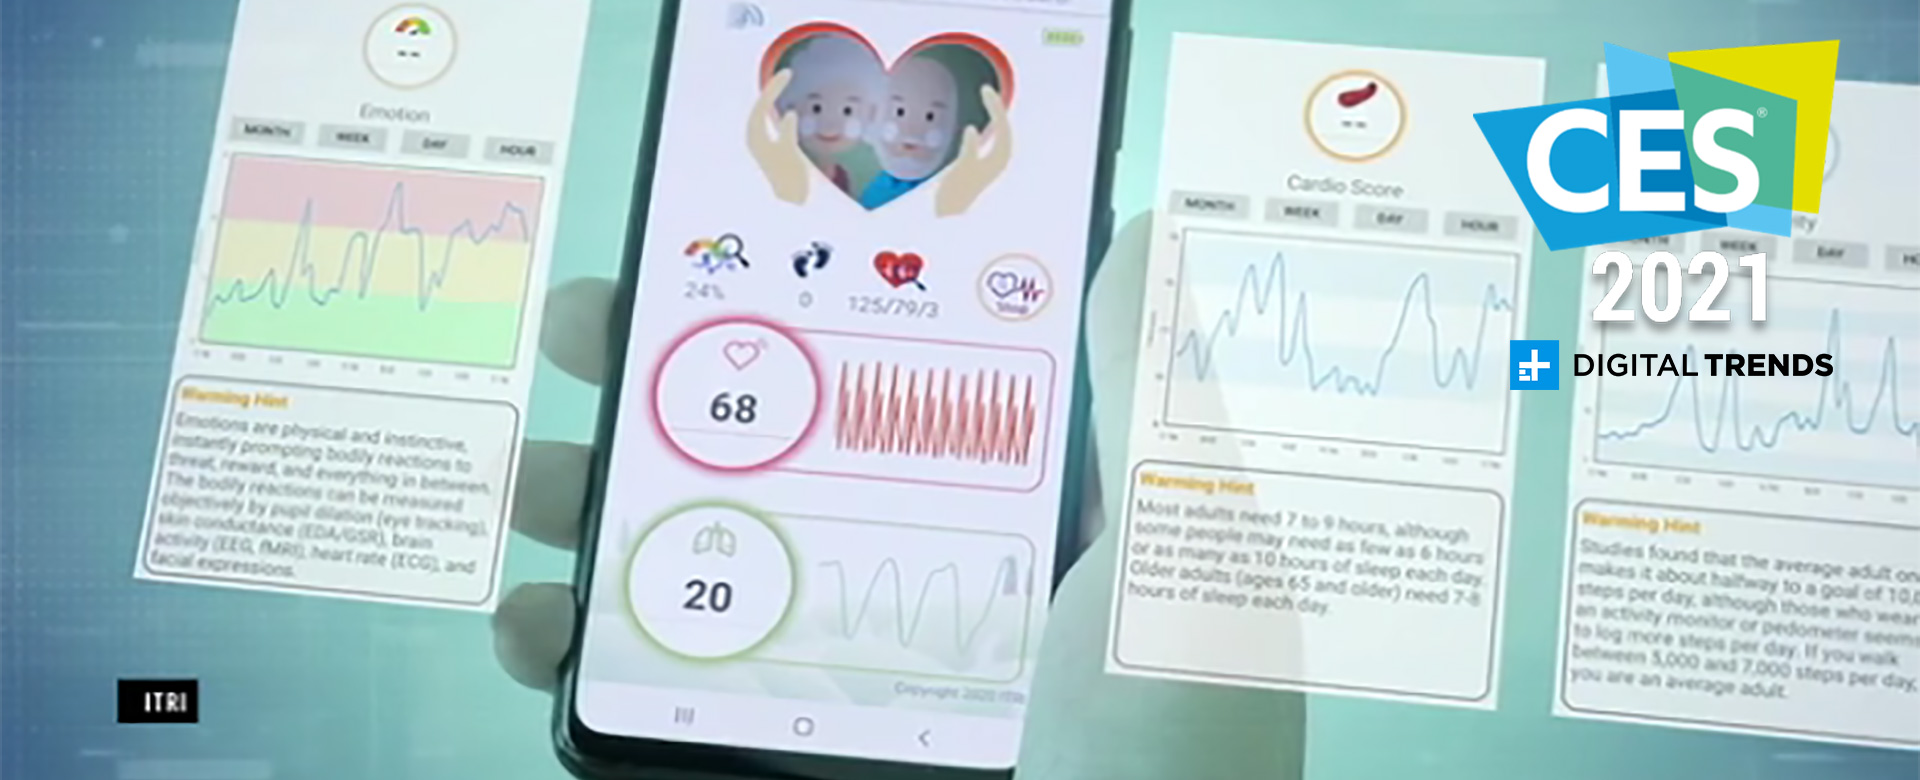 CES-2021-Digital-Health-Updates-1